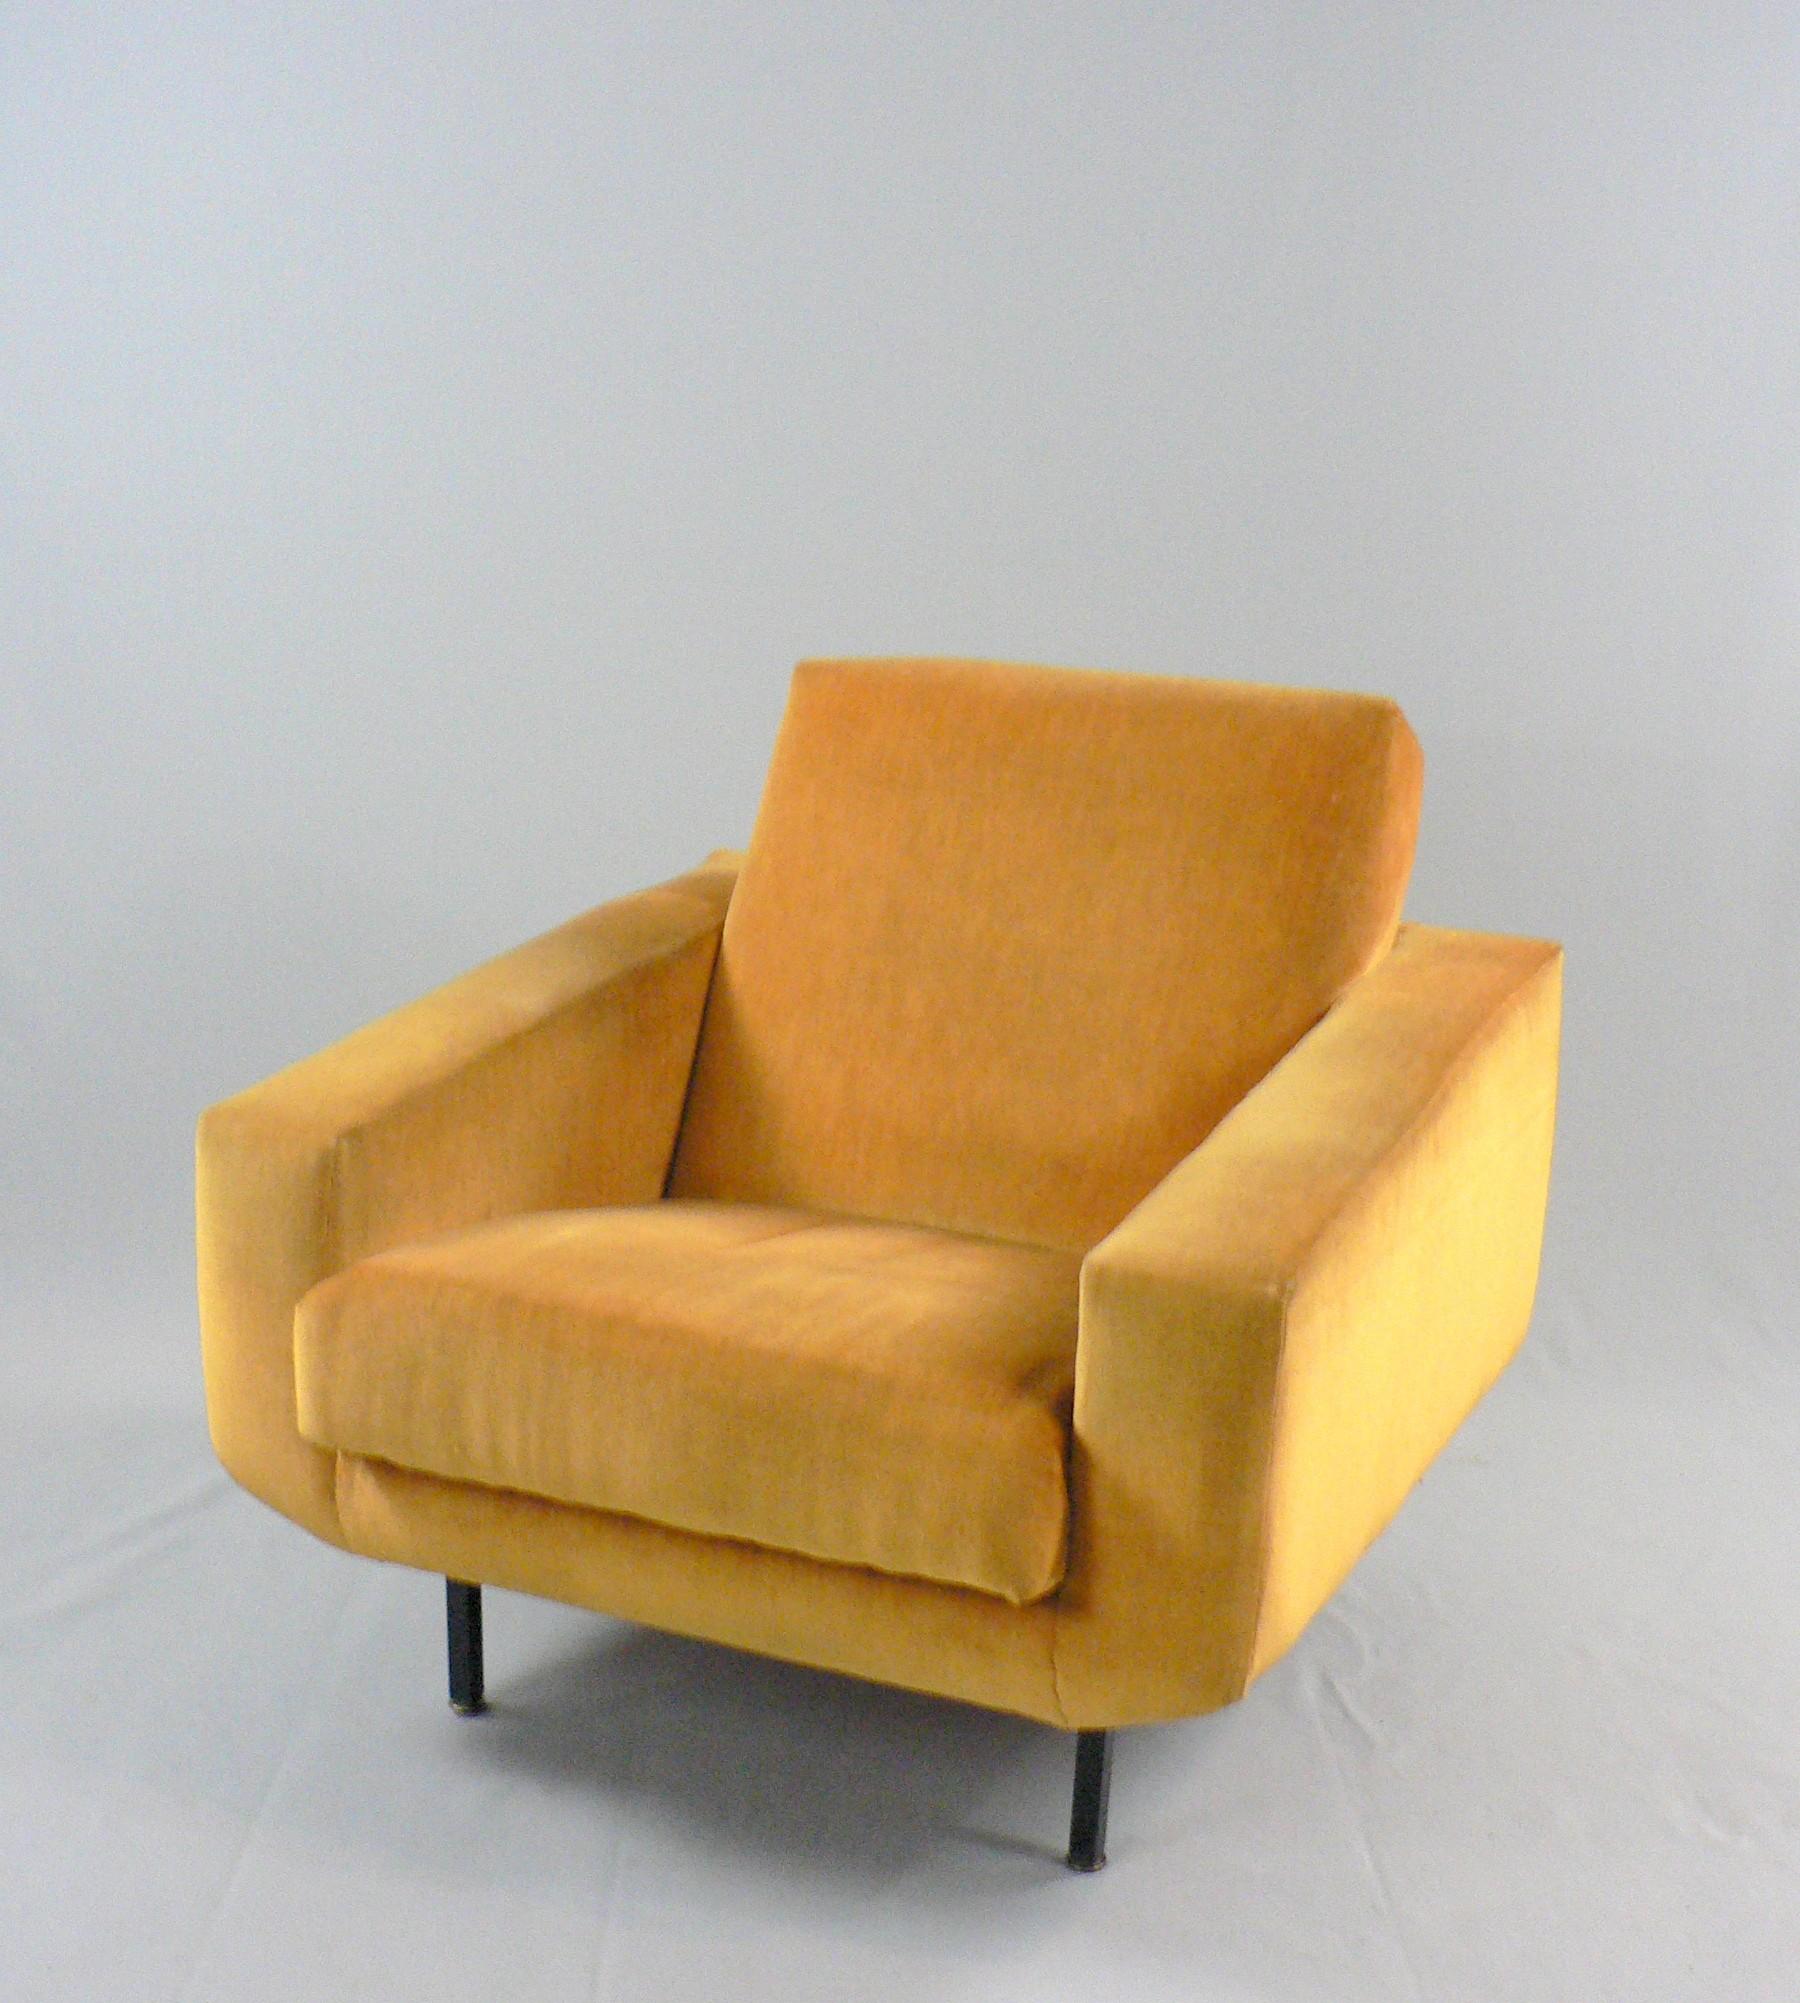 Pair of yellow velvet armchairs 1950s Design Market